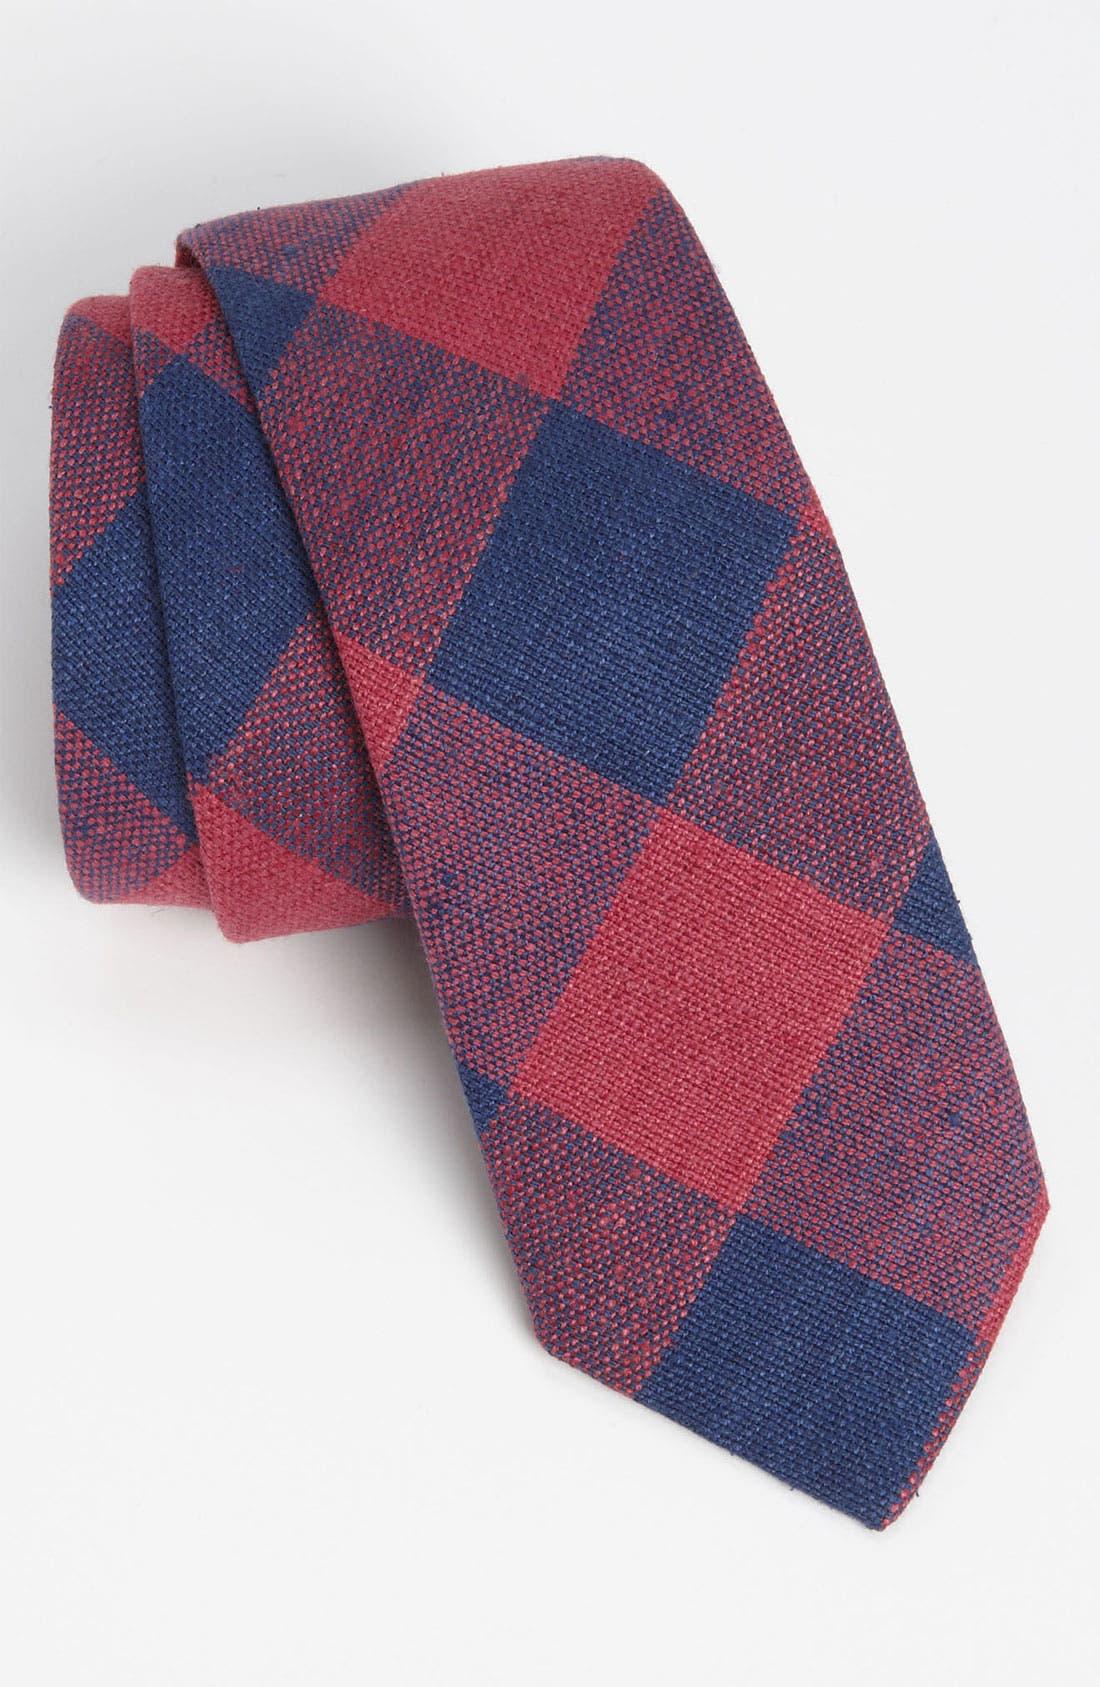 Main Image - Gitman 'Buffalo Check' Woven Silk Tie